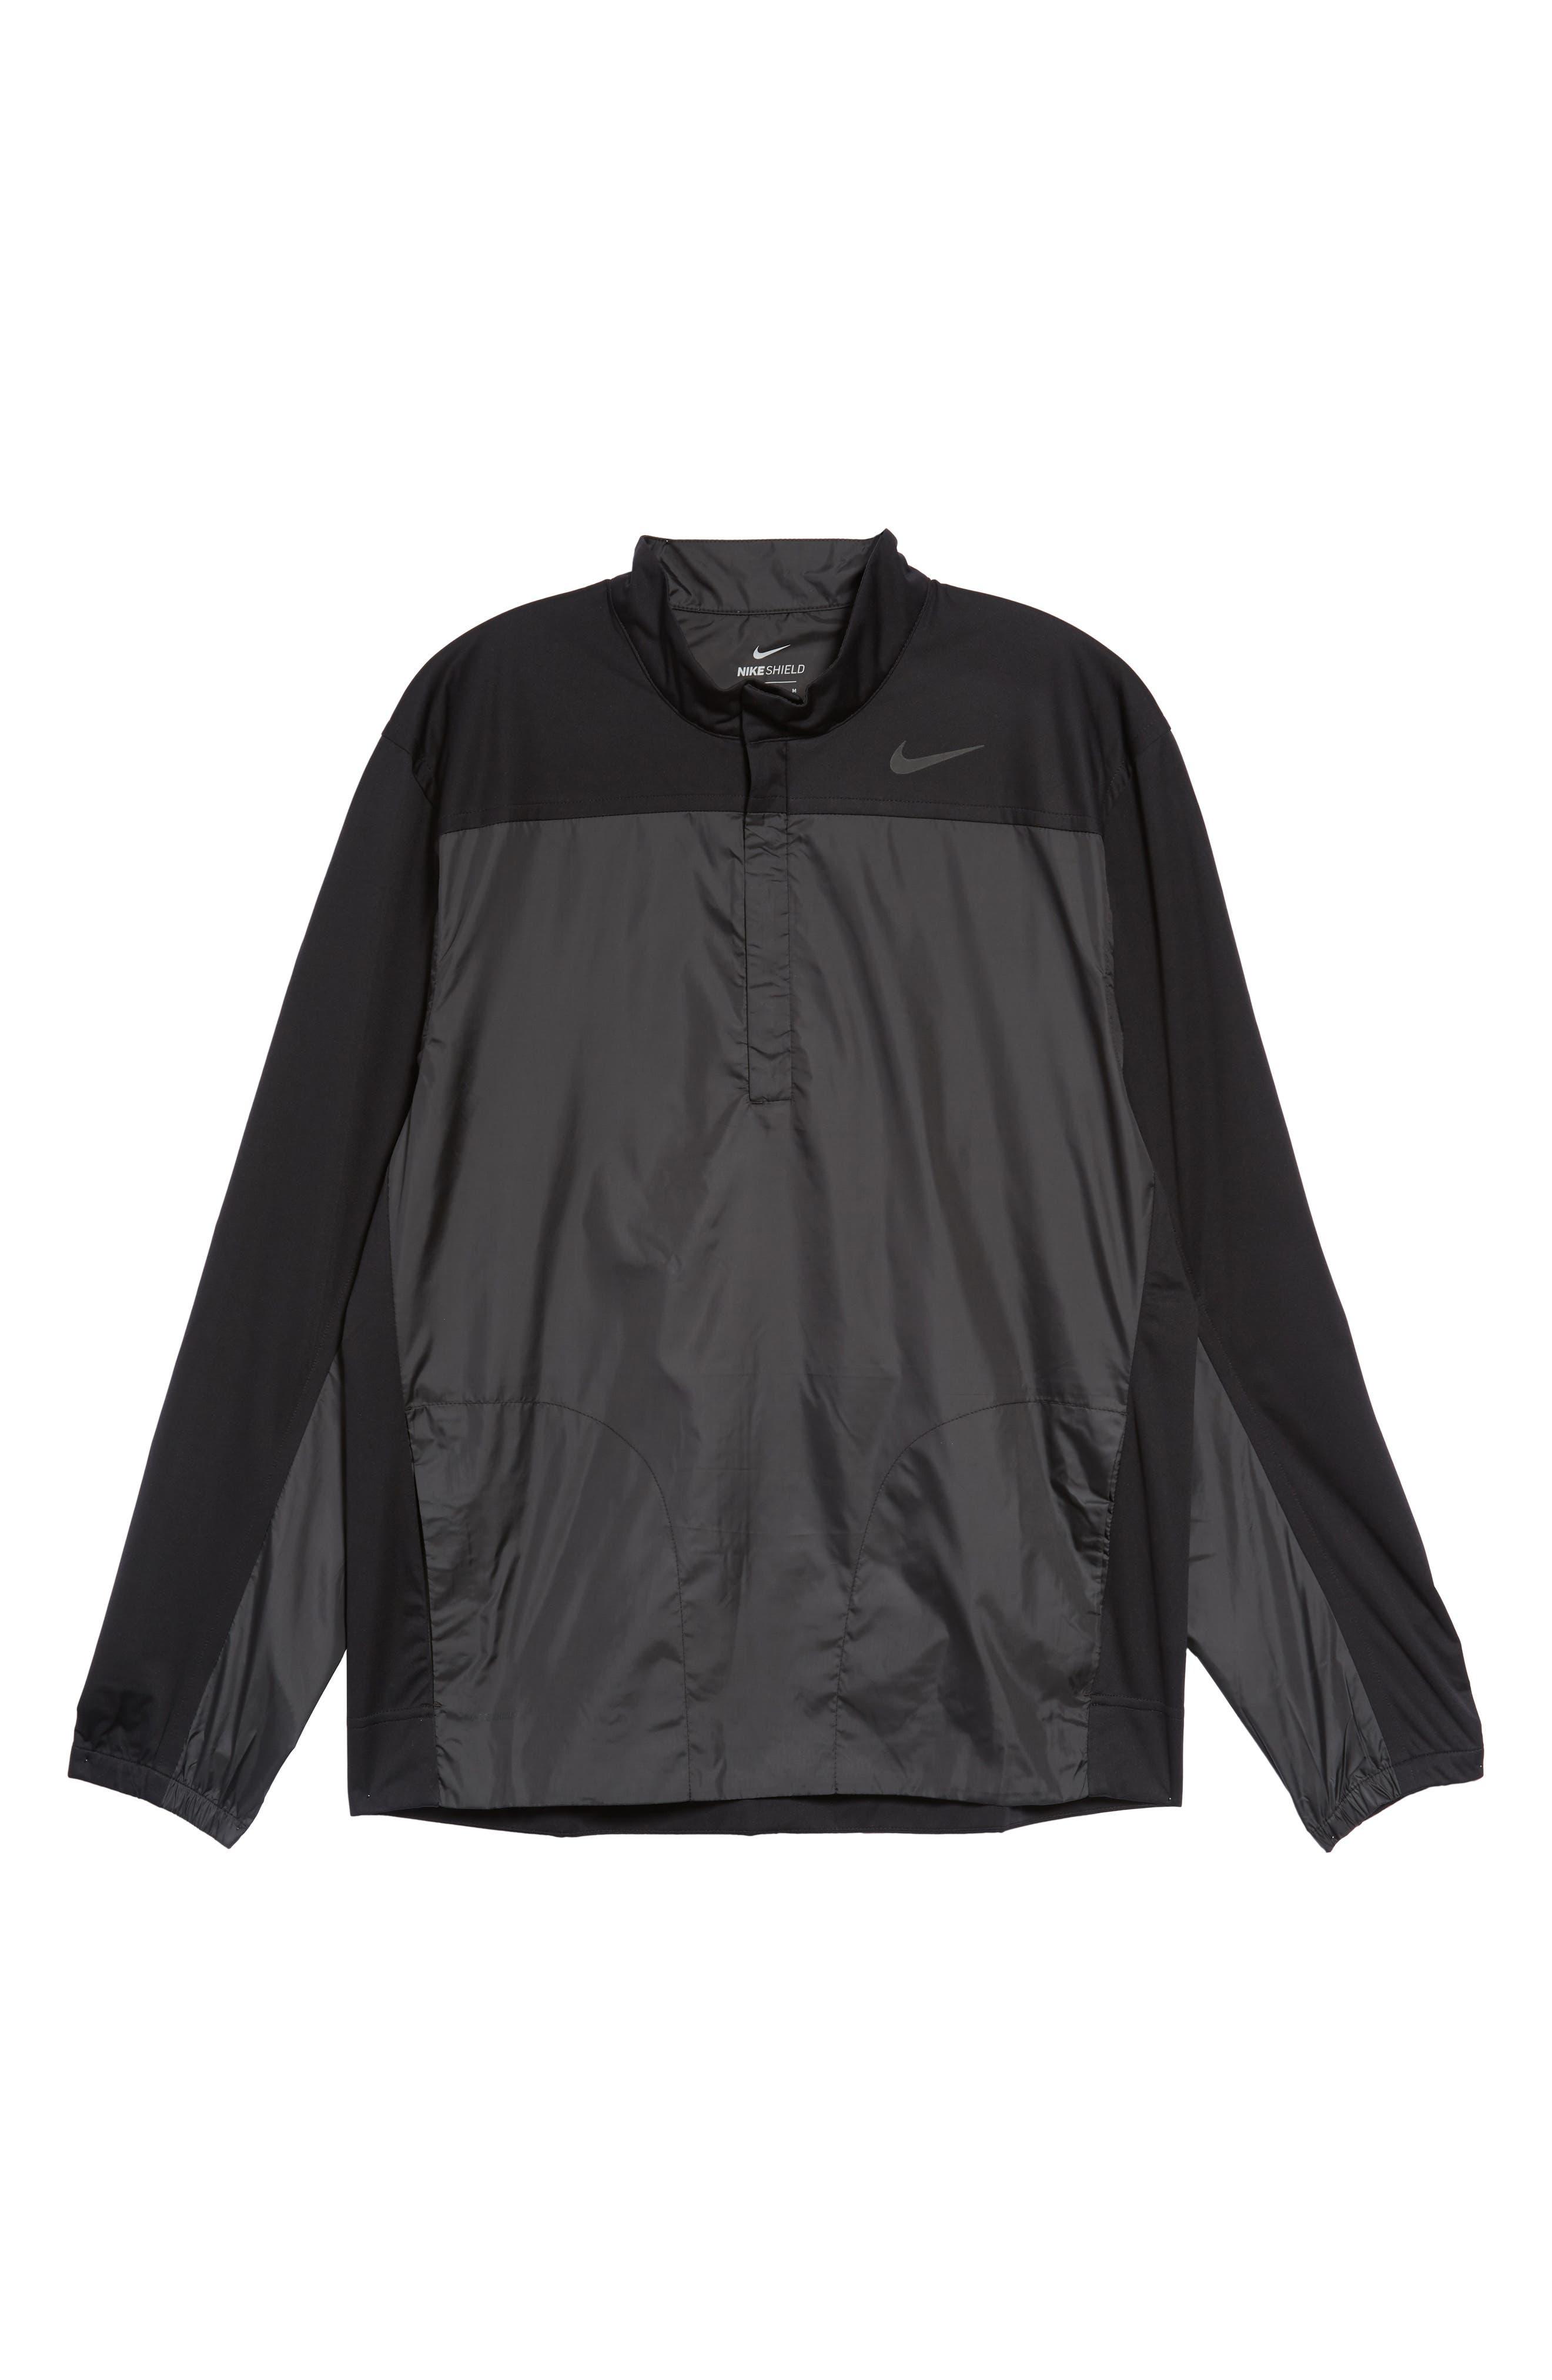 Shield Full Zip Golf Jacket,                             Alternate thumbnail 6, color,                             Black/ Silver